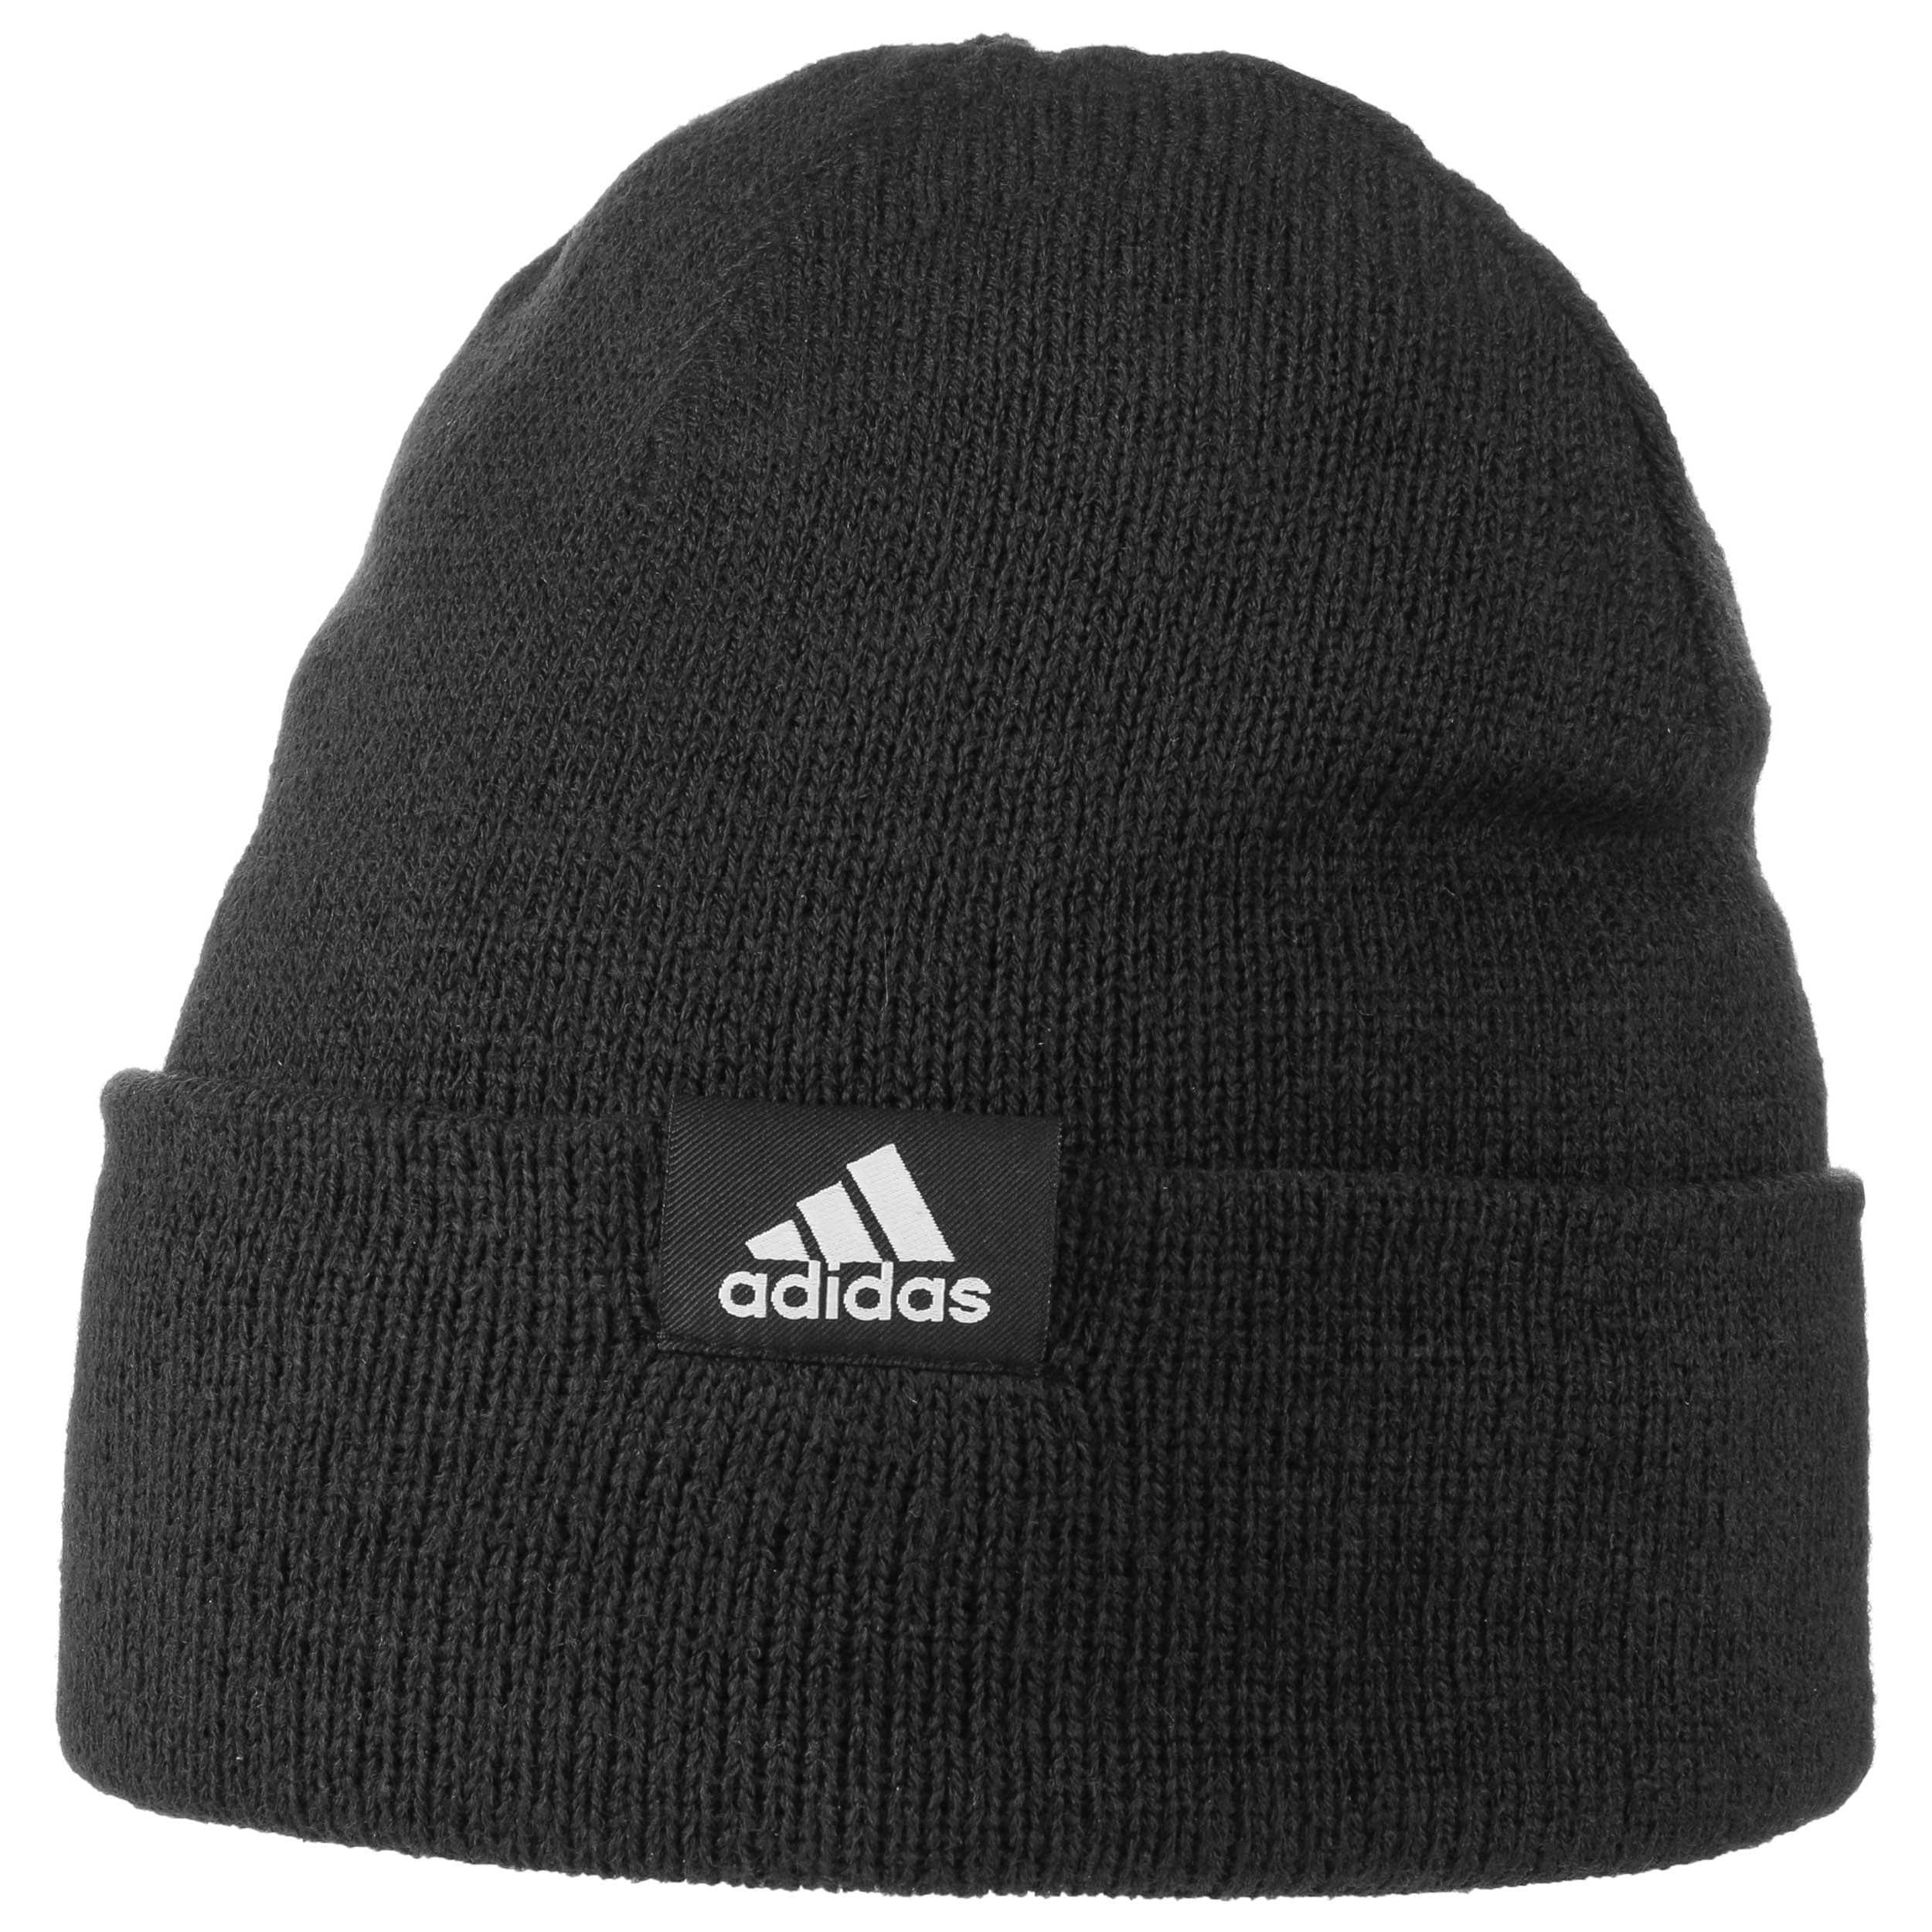 Gorro Woolie Beanie by adidas - Gorros - sombreroshop.es 1cd9aed5c0e